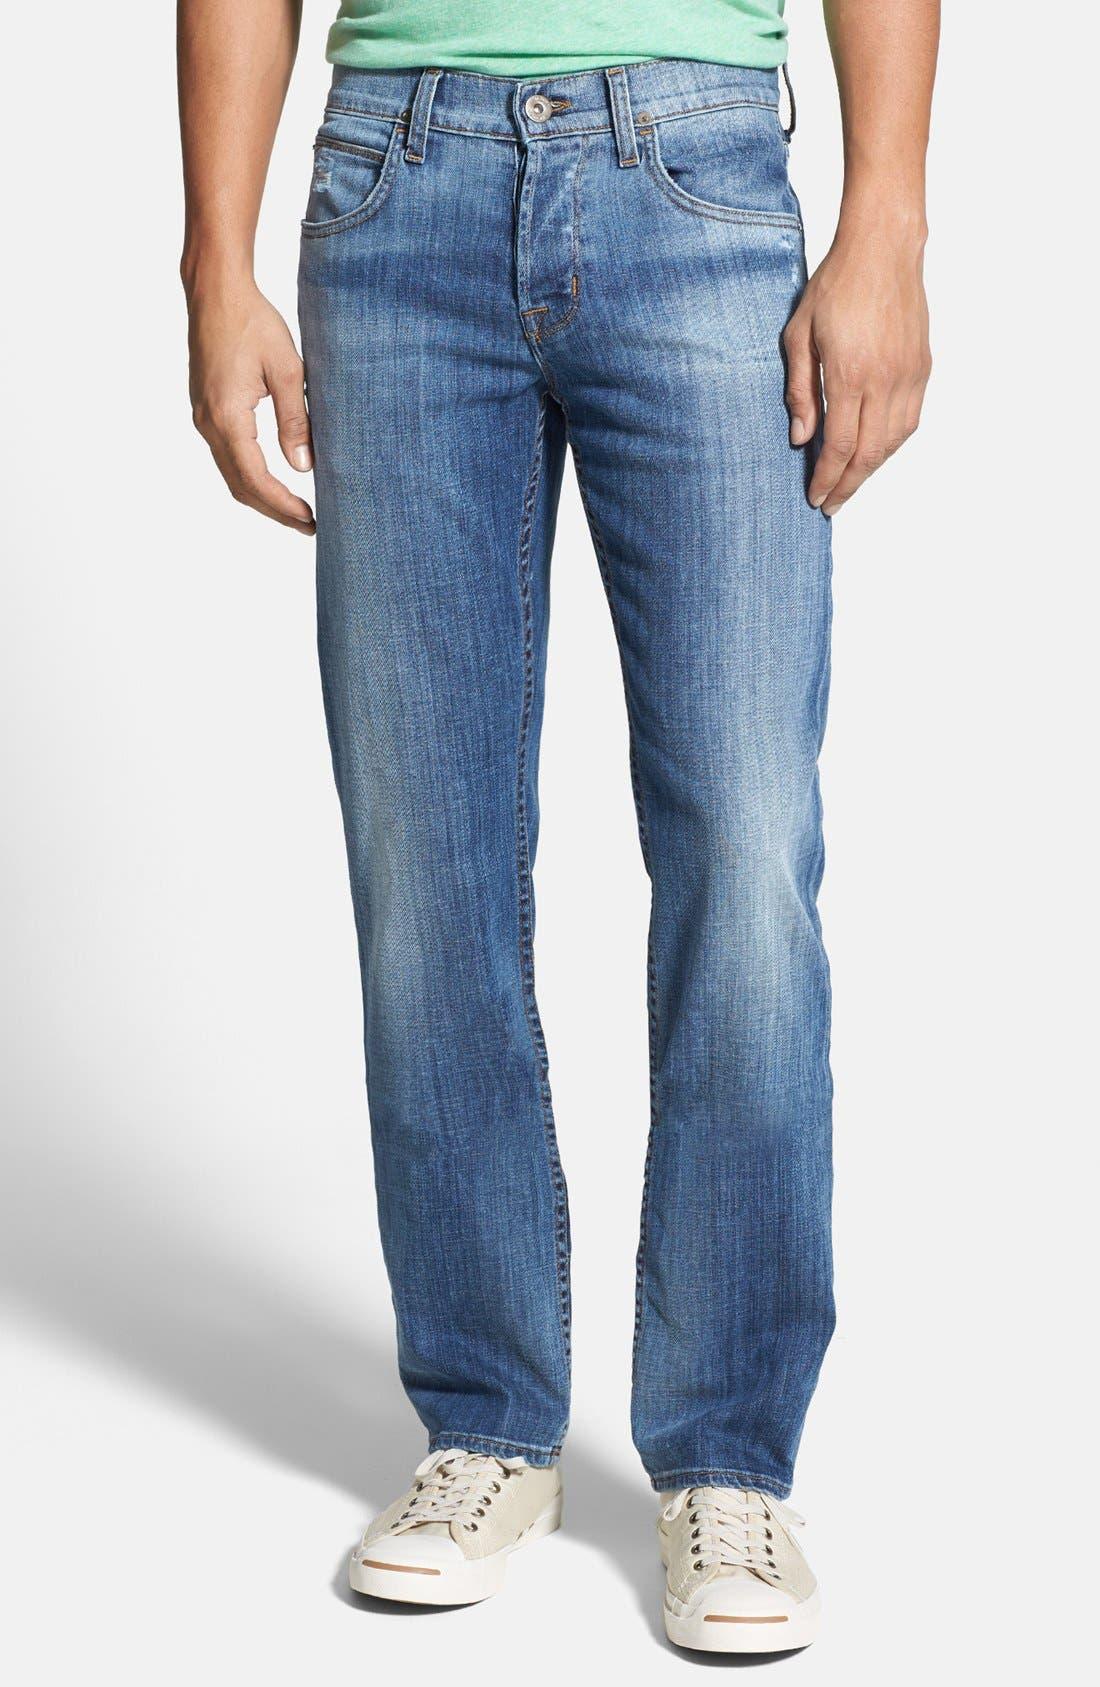 Alternate Image 1 Selected - Hudson Jeans 'Byron' Straight Leg Jeans (Highway)